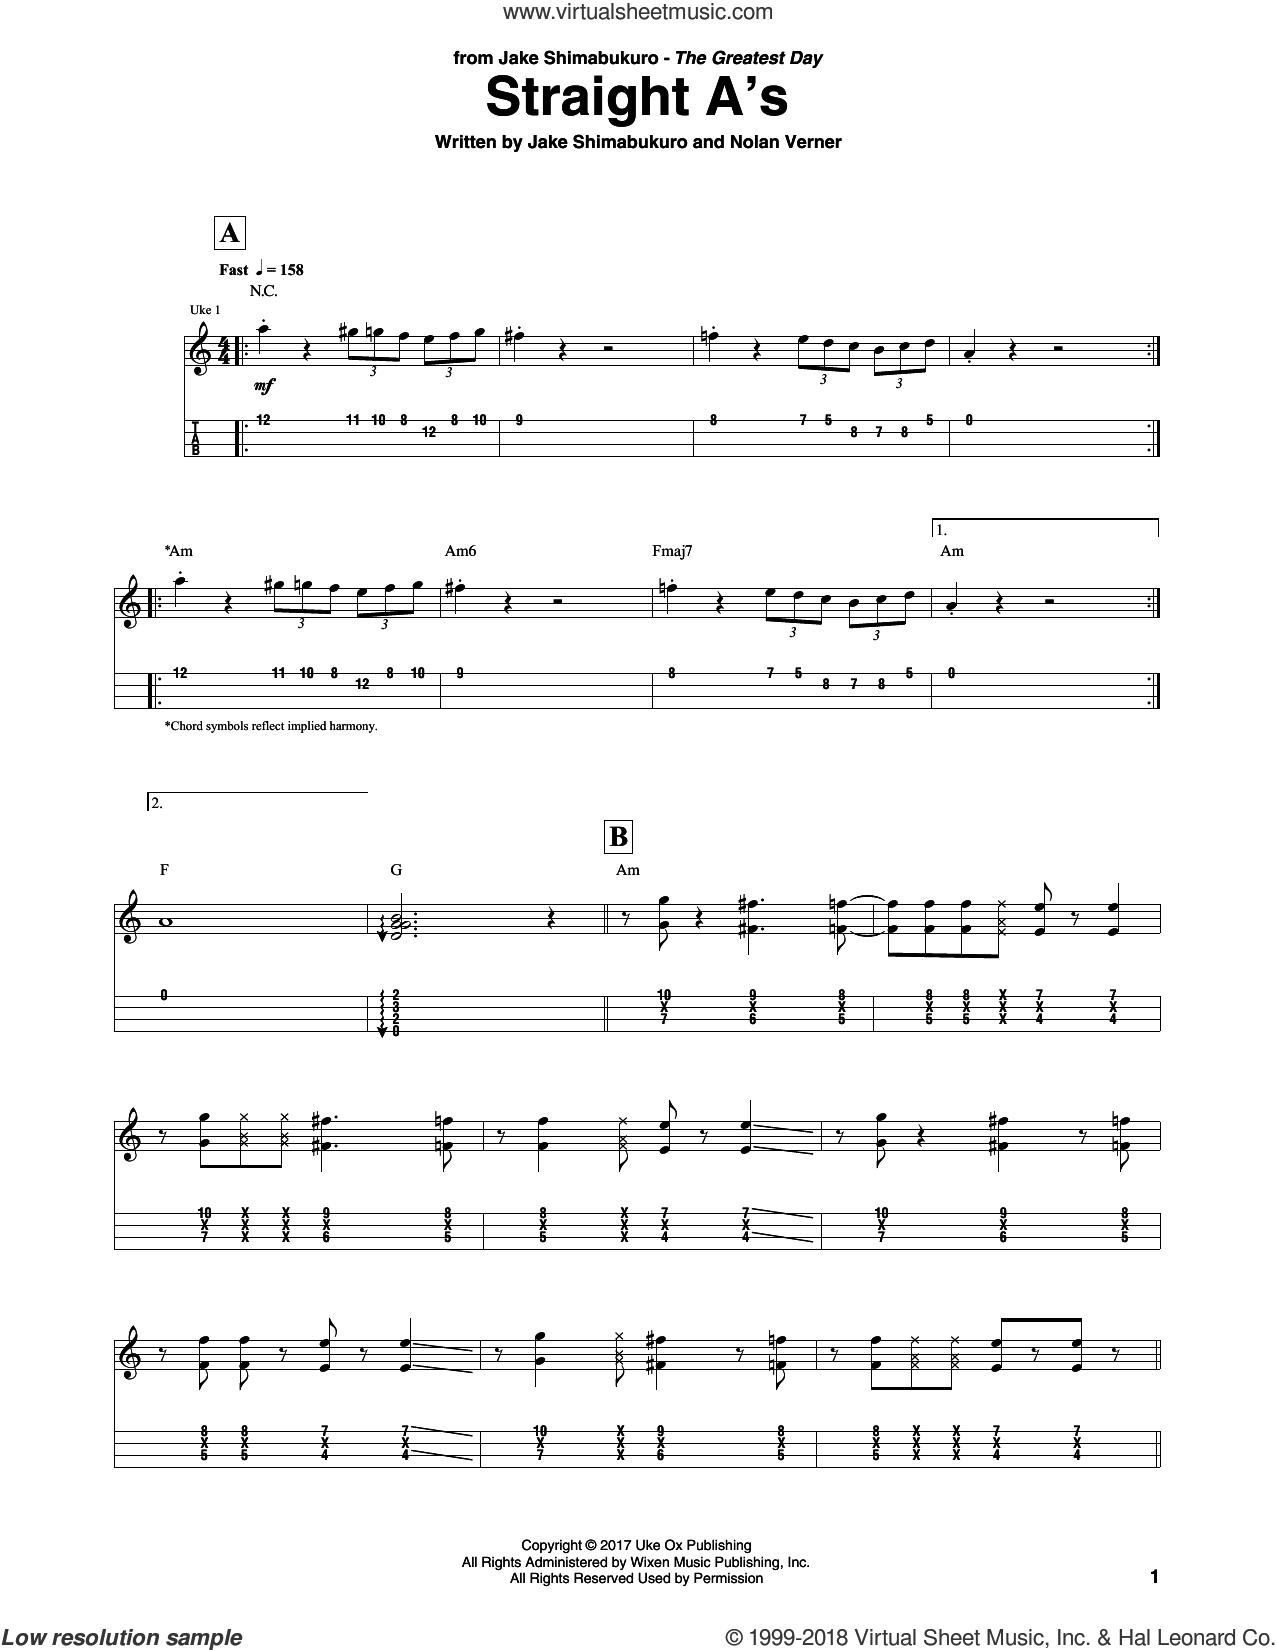 Straight A's sheet music for ukulele (tablature) by Jake Shimabukuro and Nolan Verner, intermediate skill level